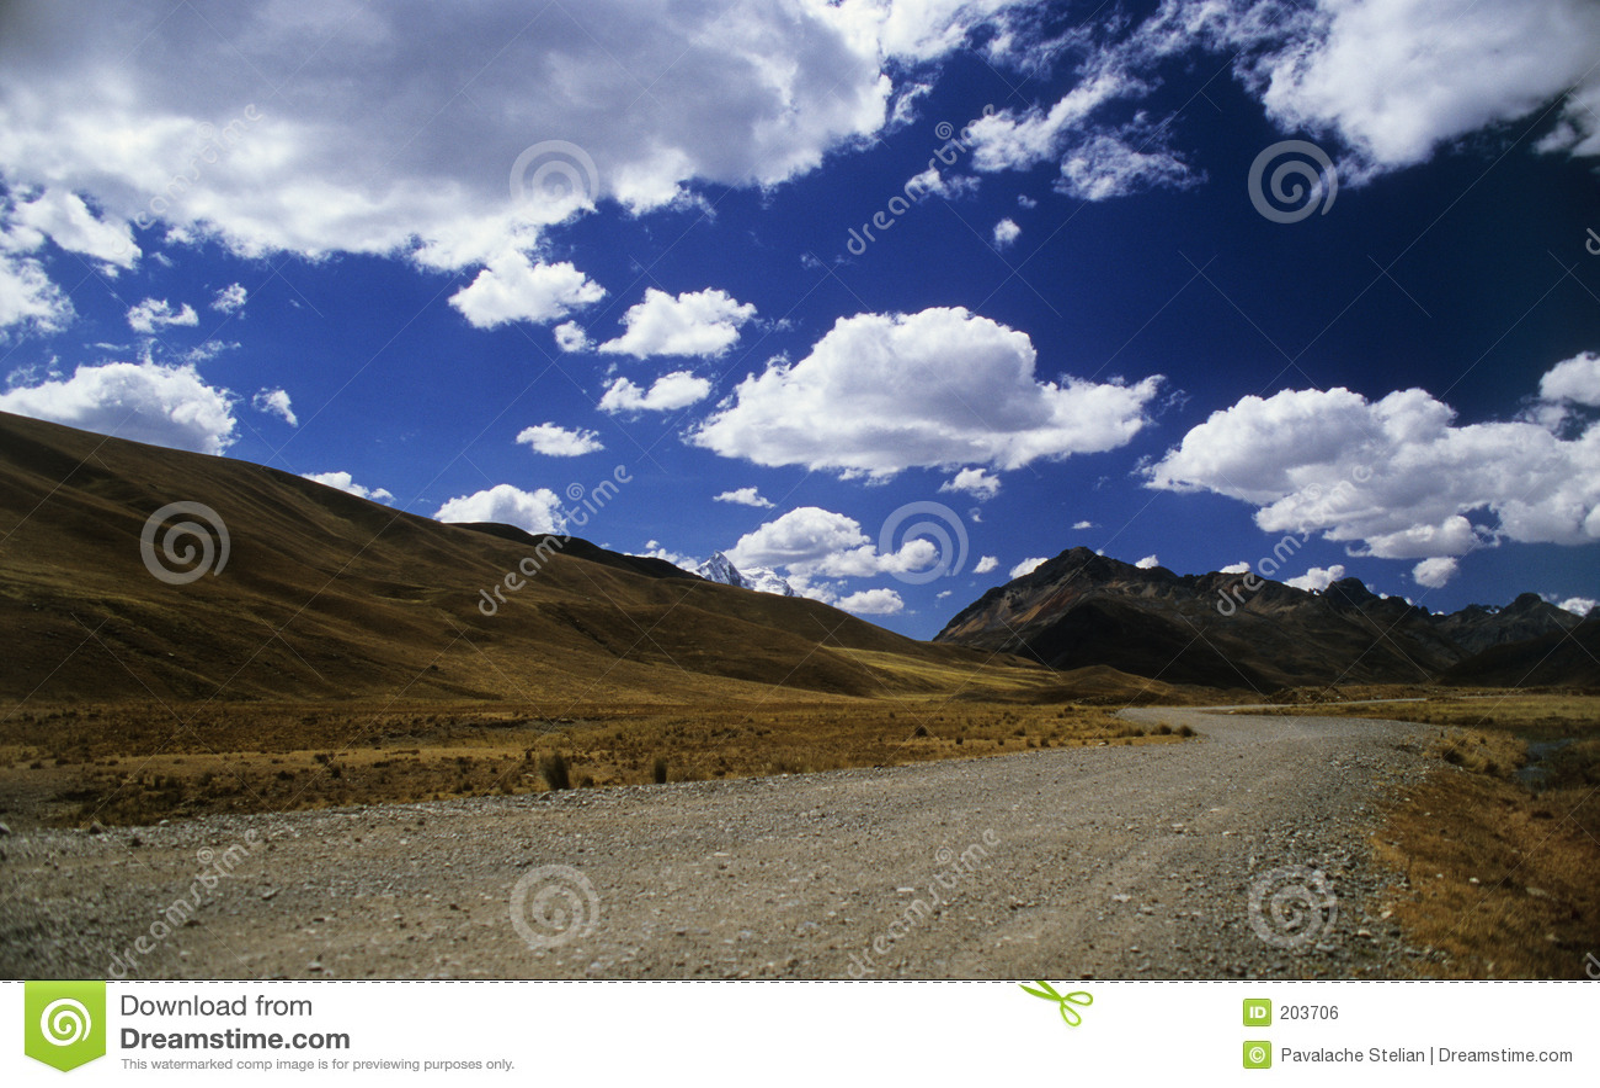 Strada a cielo #1